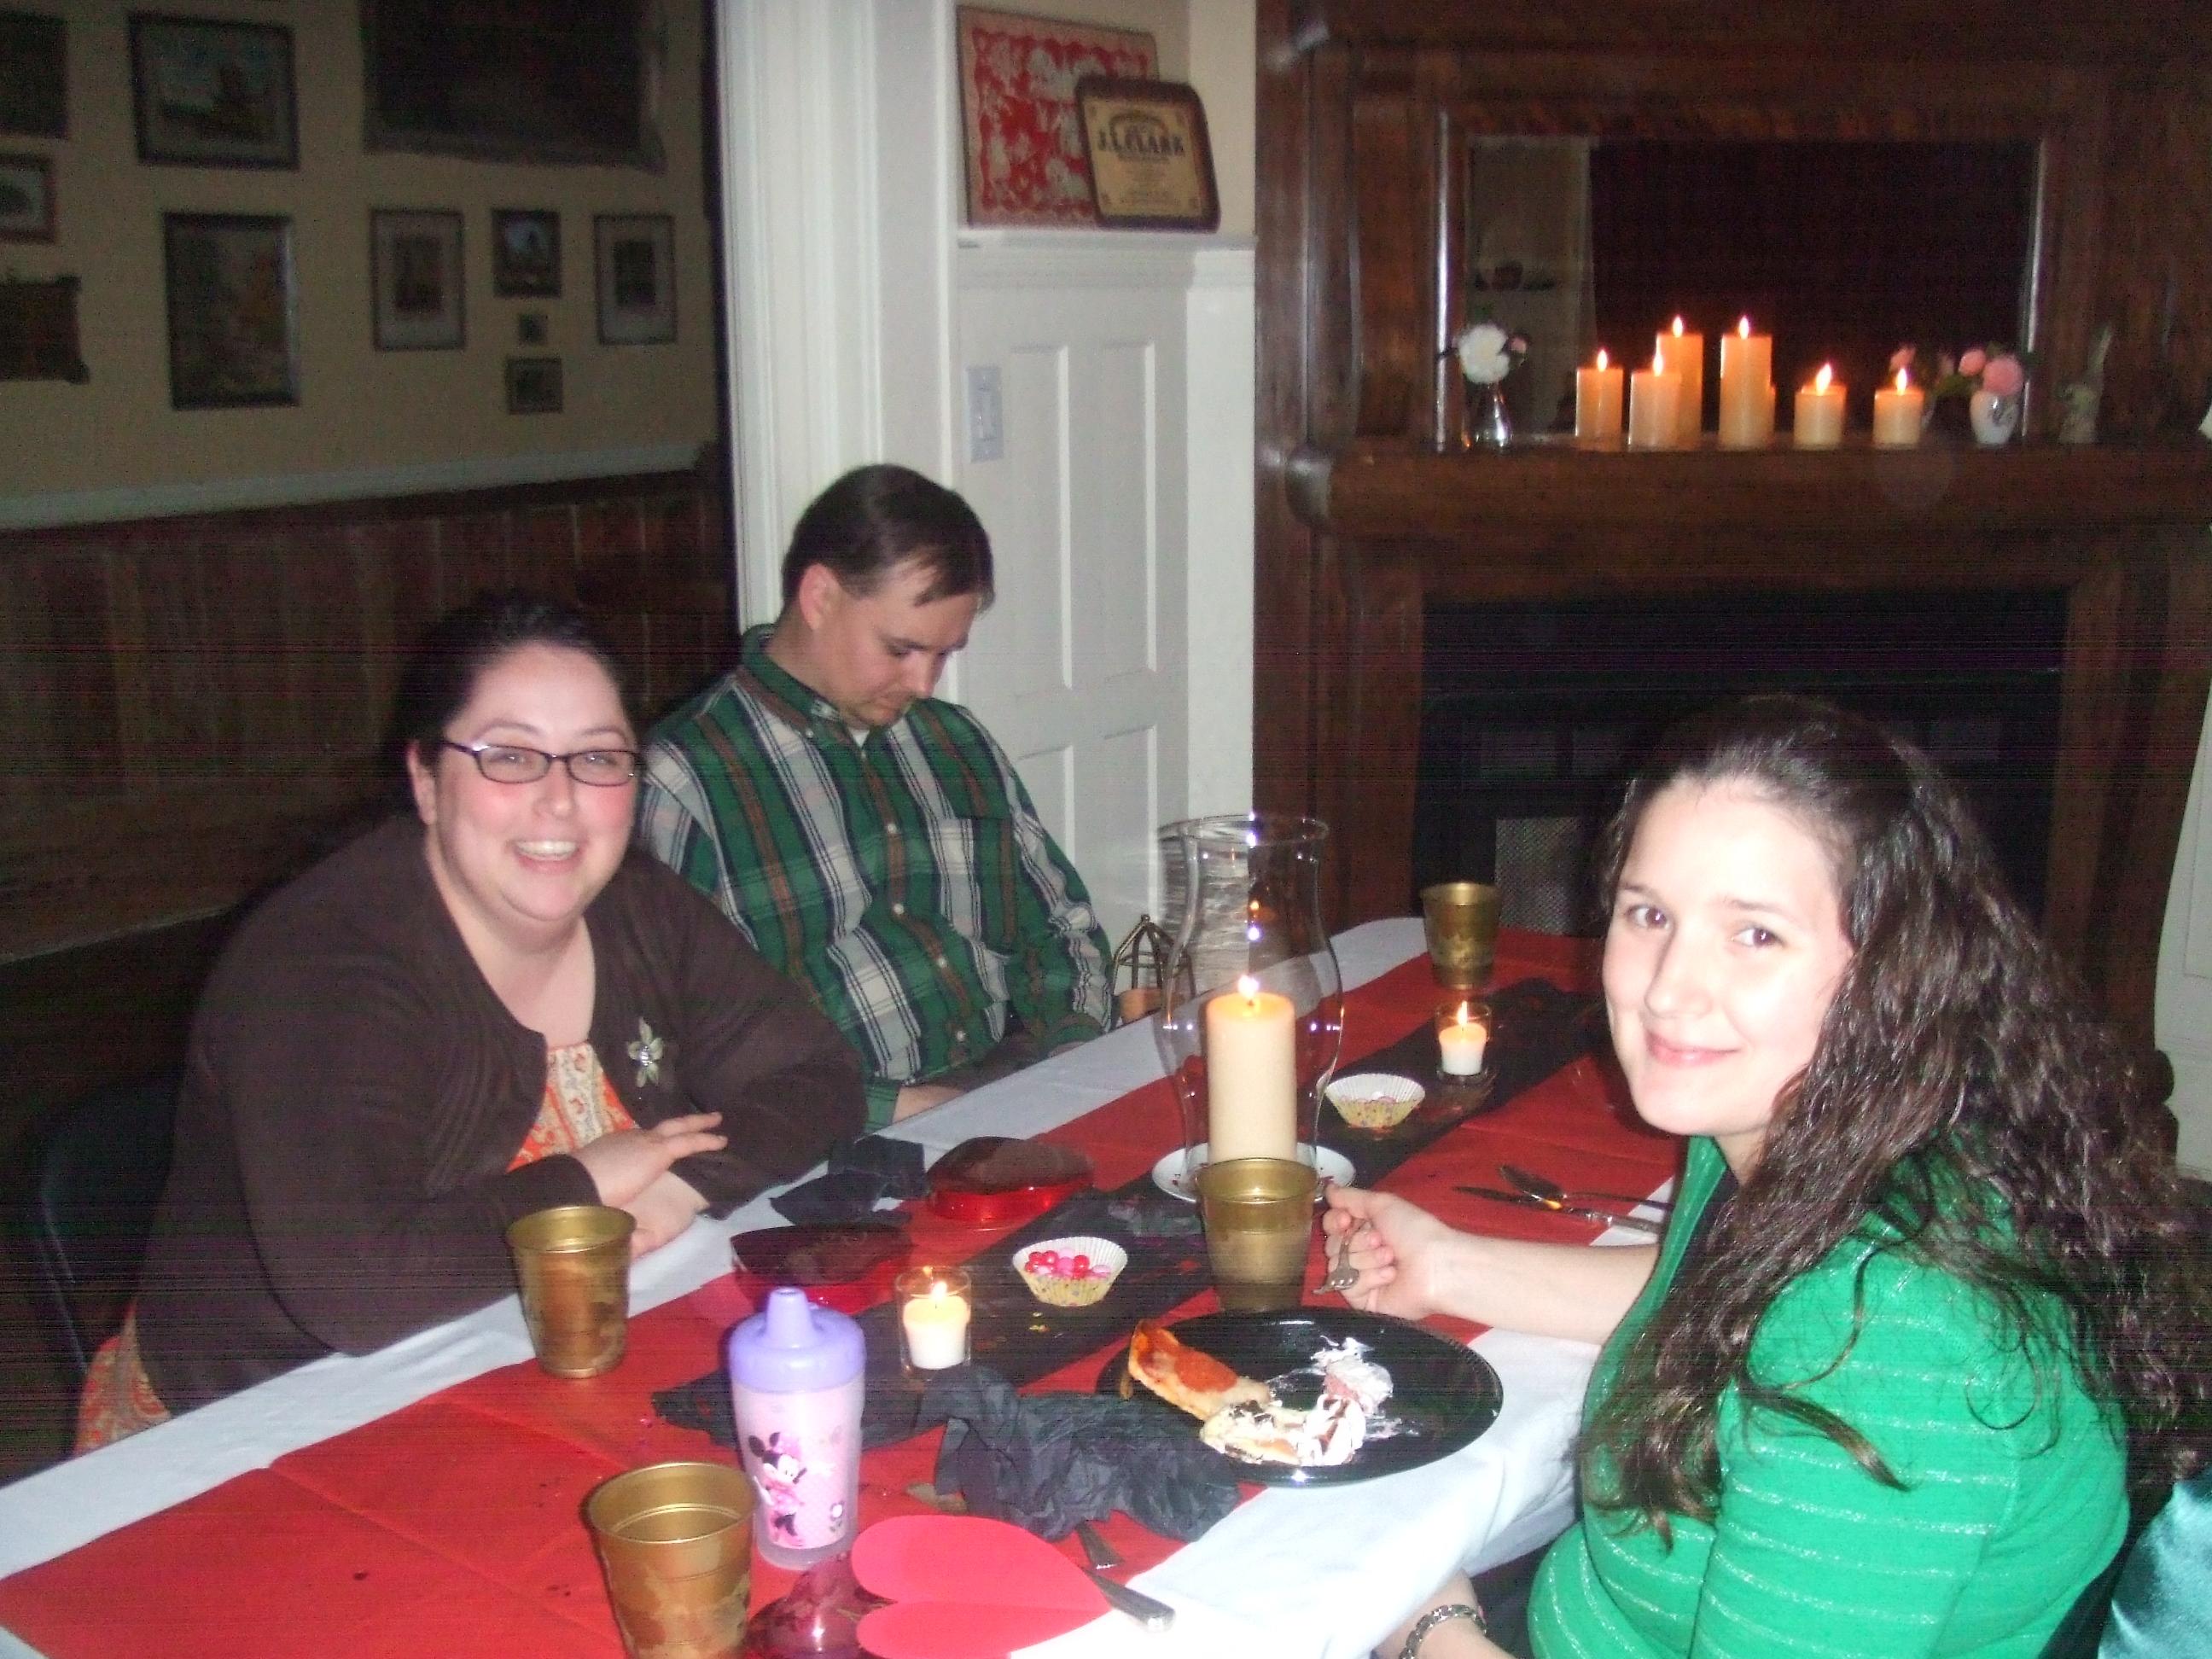 Brandi, Brian and Amy